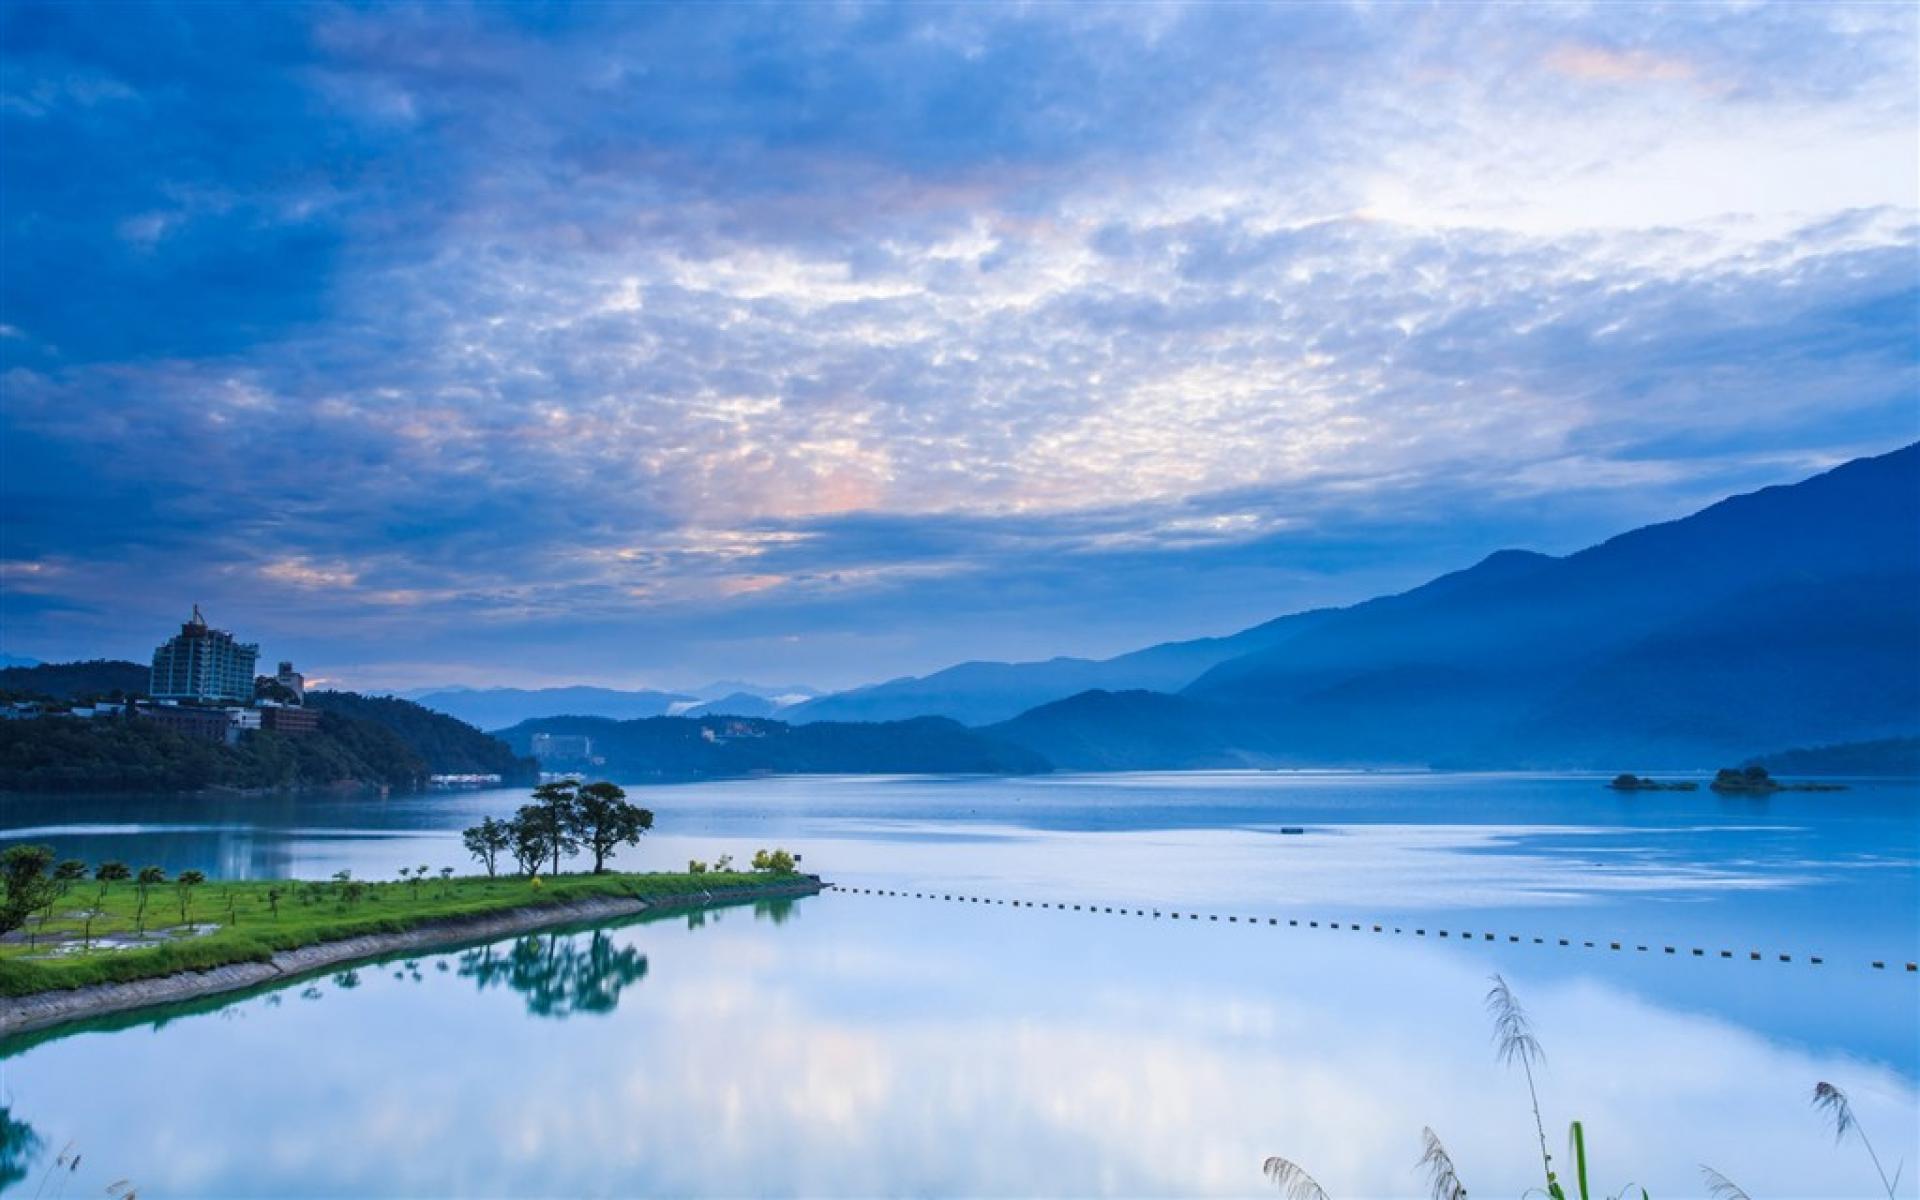 den-dai-loan-thuong-ngoan-ve-dep-tien-canh-cua-ho-nhat-nguyet-1505381422